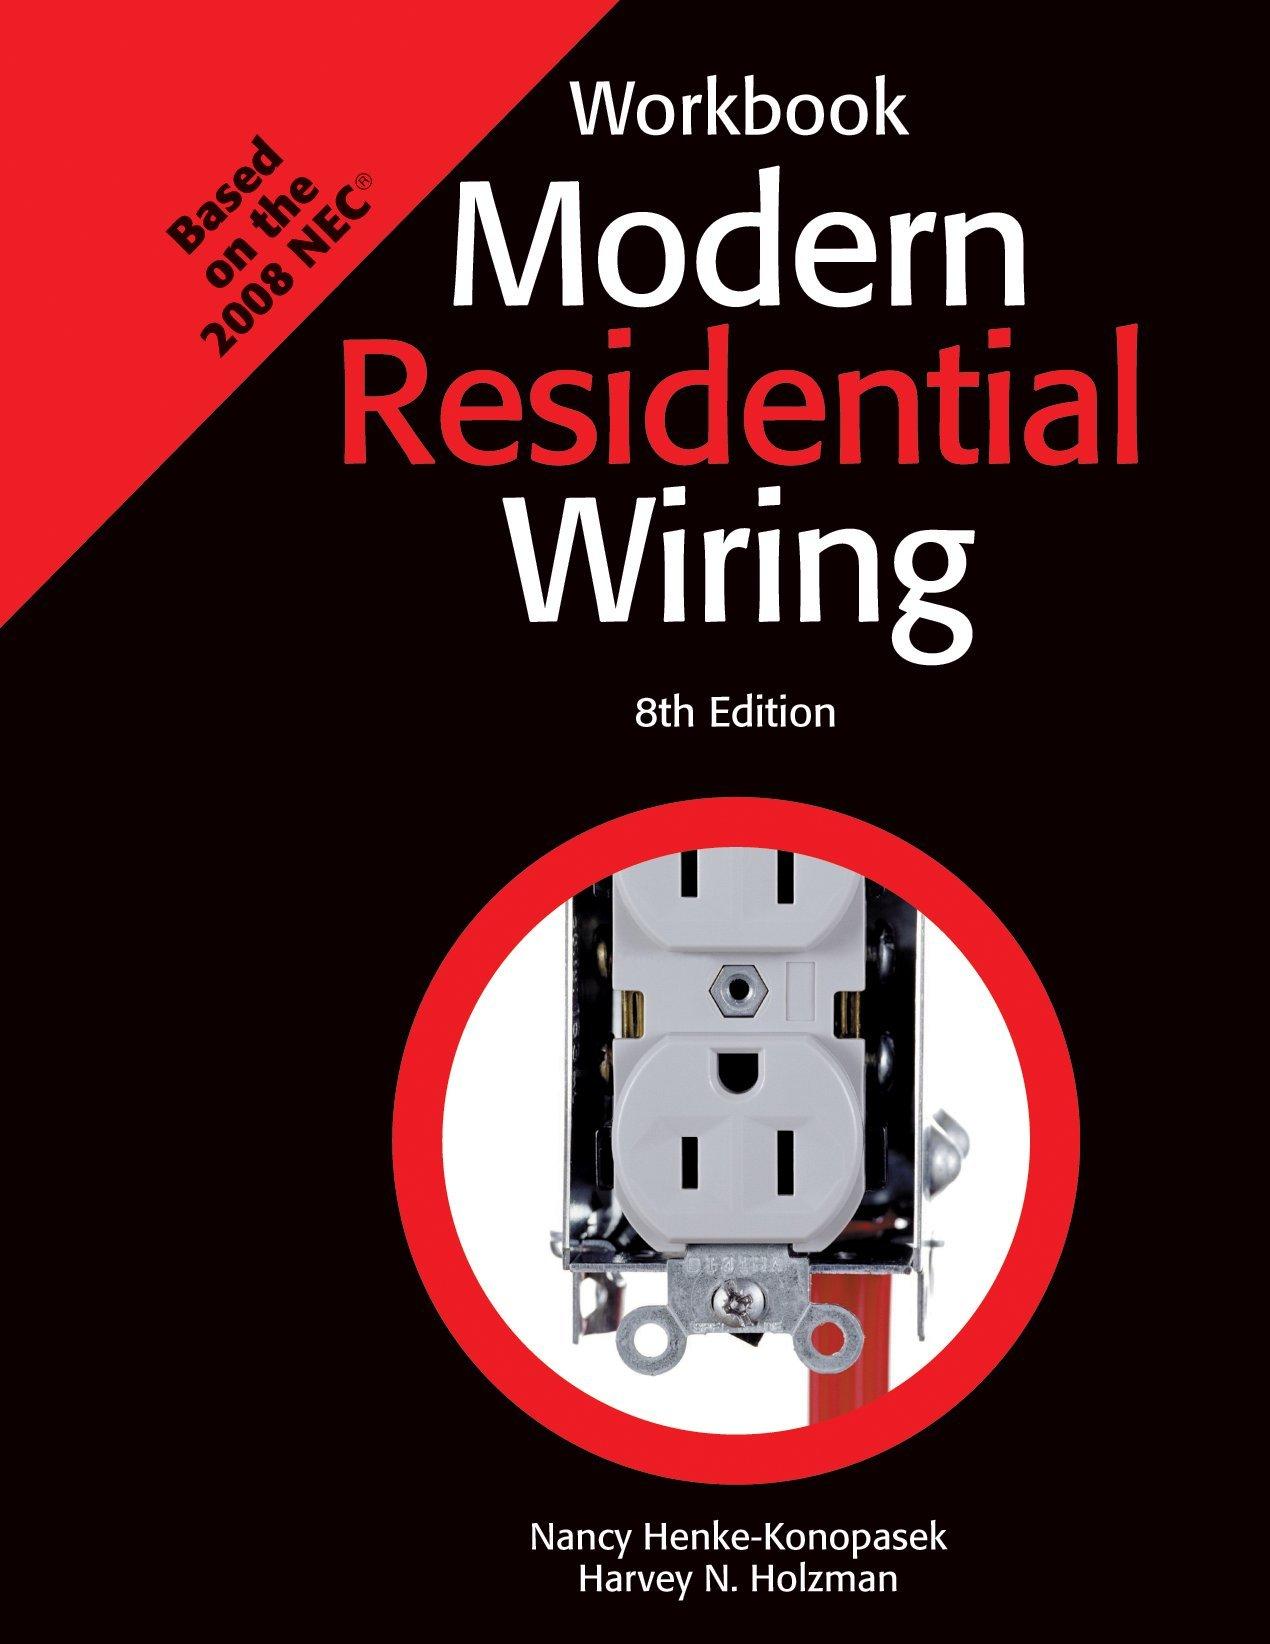 Modern Residential Wiring: Amazon.co.uk: Harvey N Holzman, Nancy  Henke-Konopasek: 9781590708965: Books